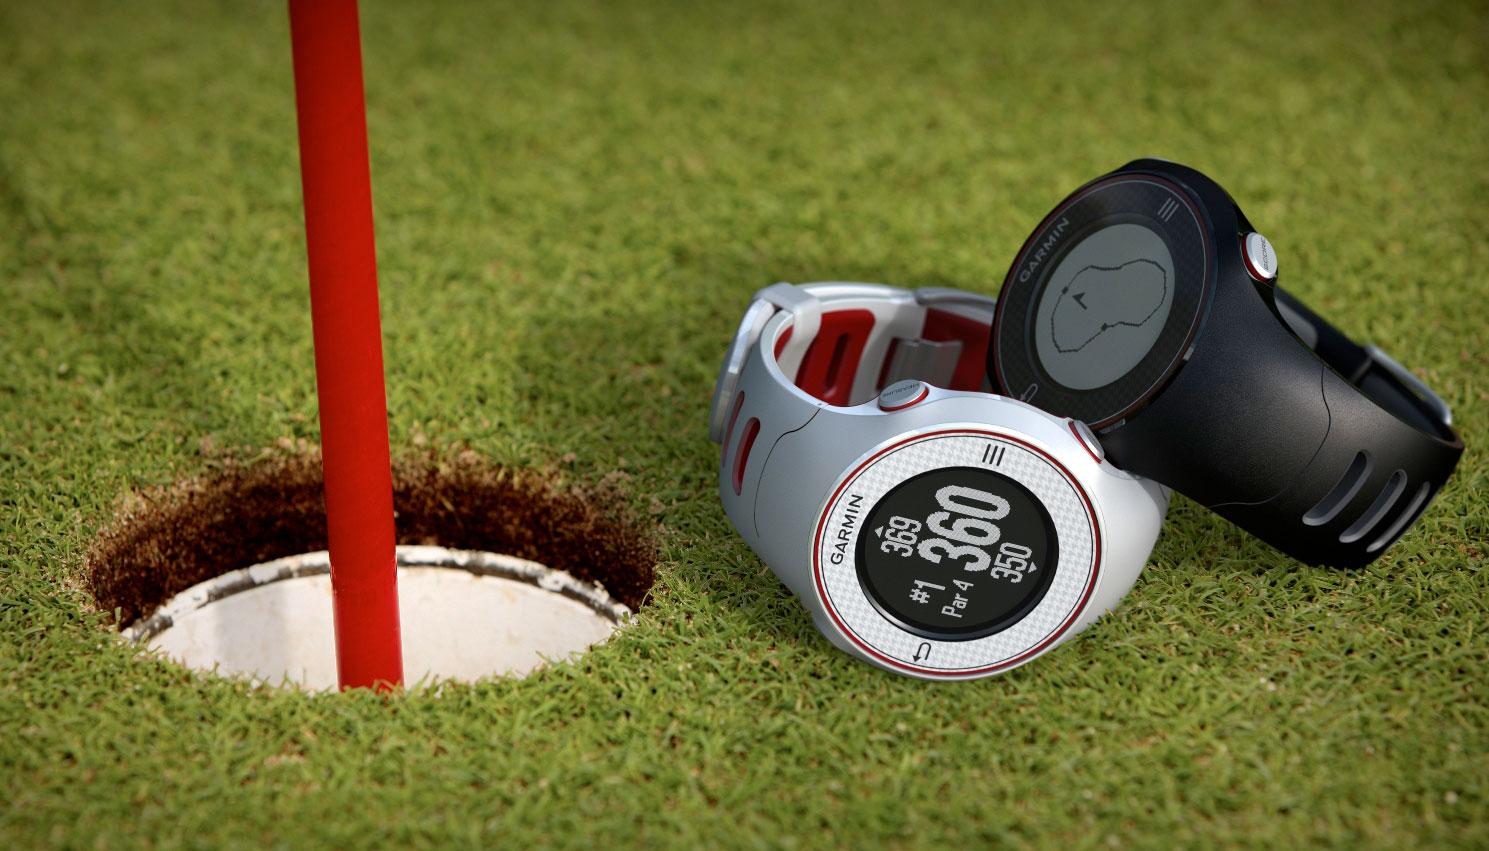 Entfernungsmesser Golf Aldi : Test garmin approach s u gps auf dem golfplatz a pocketnavigation